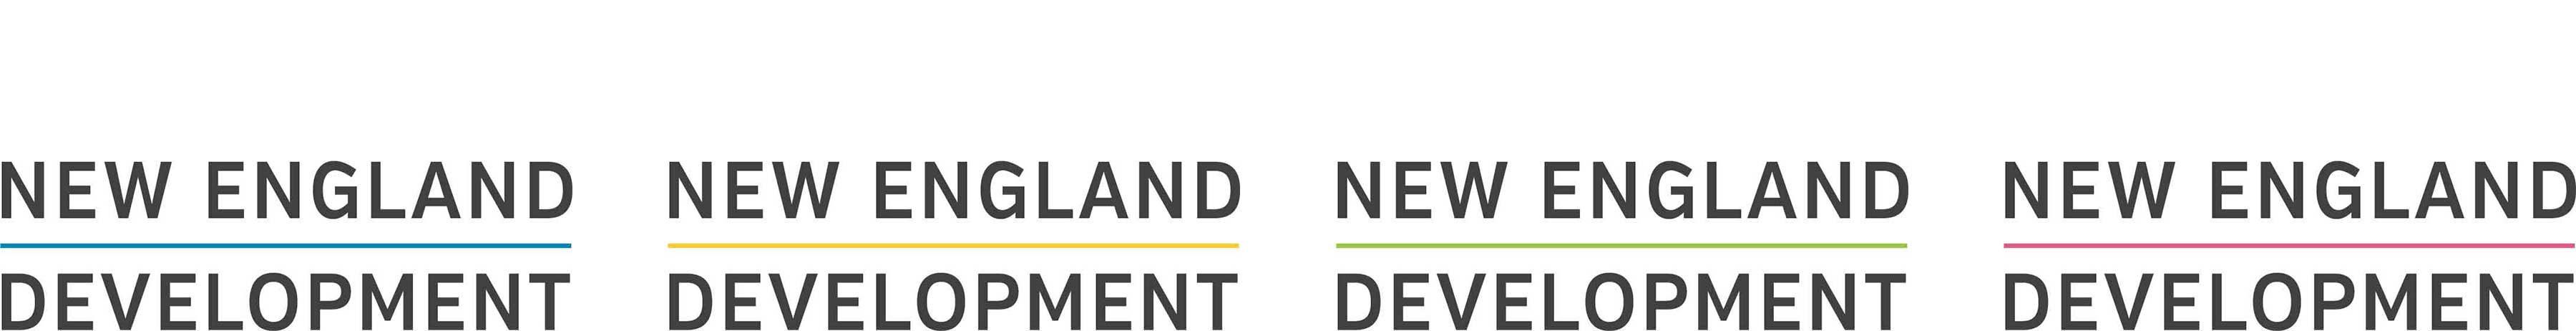 New England Development identifiers